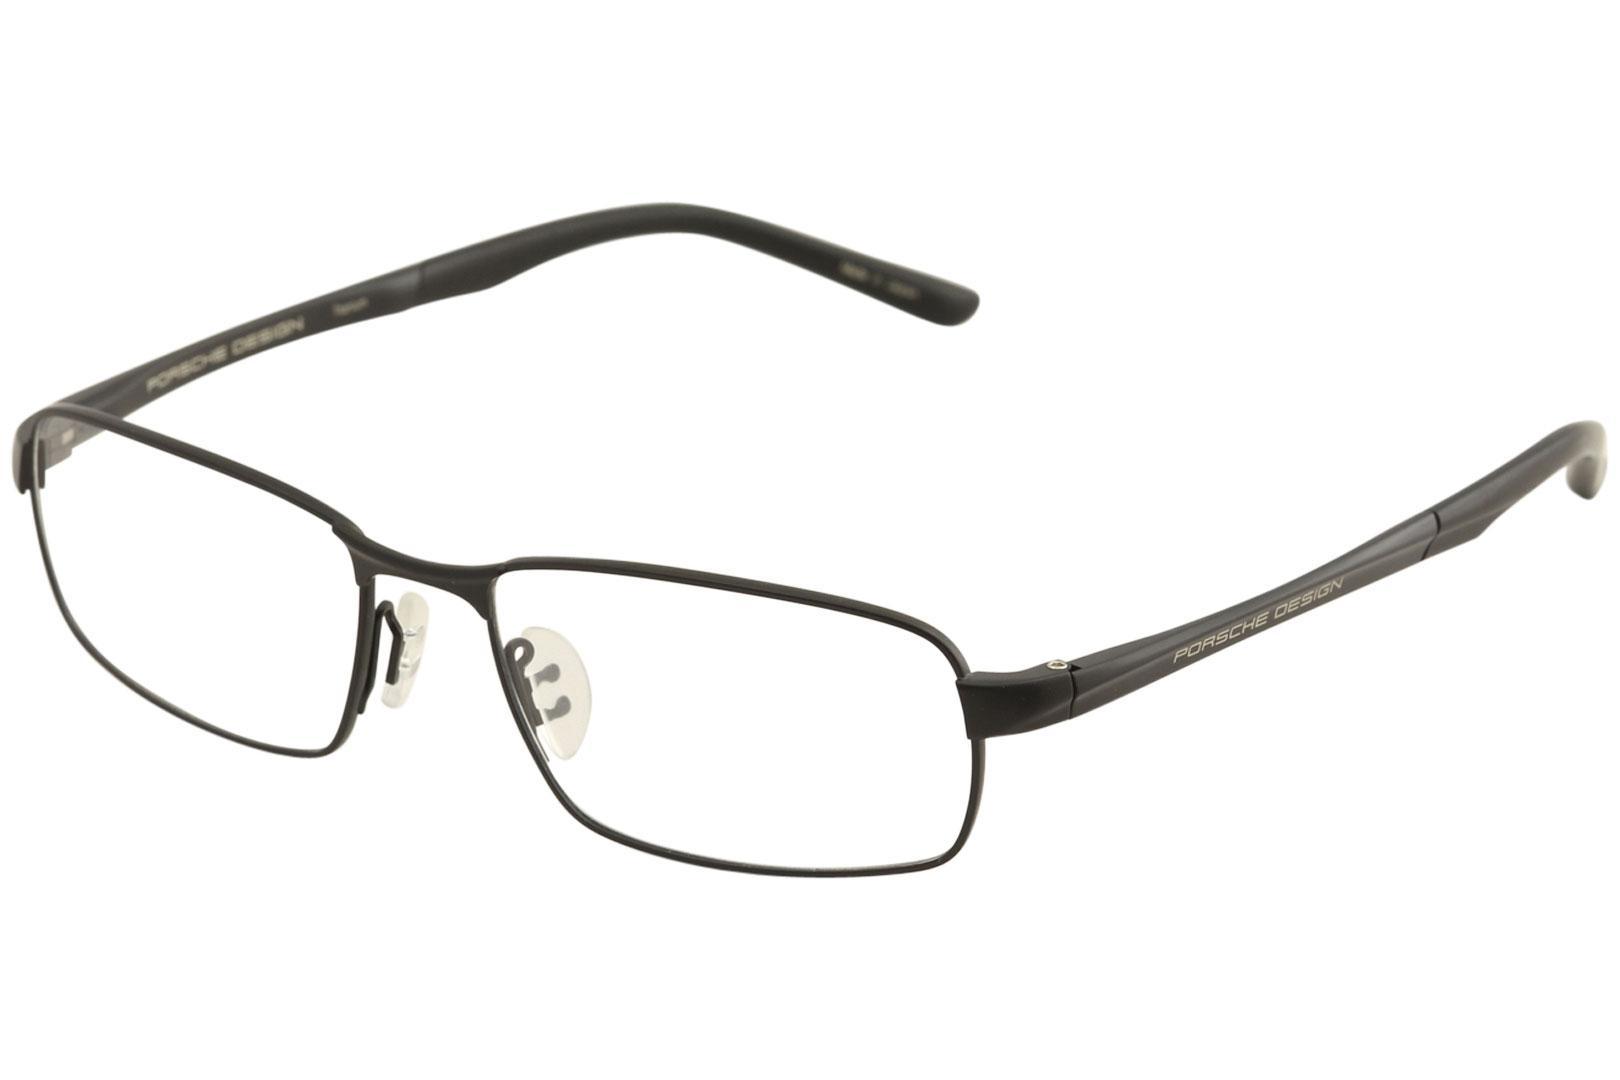 22a4acf866a Porsche Design Men s Eyeglasses P8212 P 8212 Full Rim Titanium Optical Frame  by Porsche Design